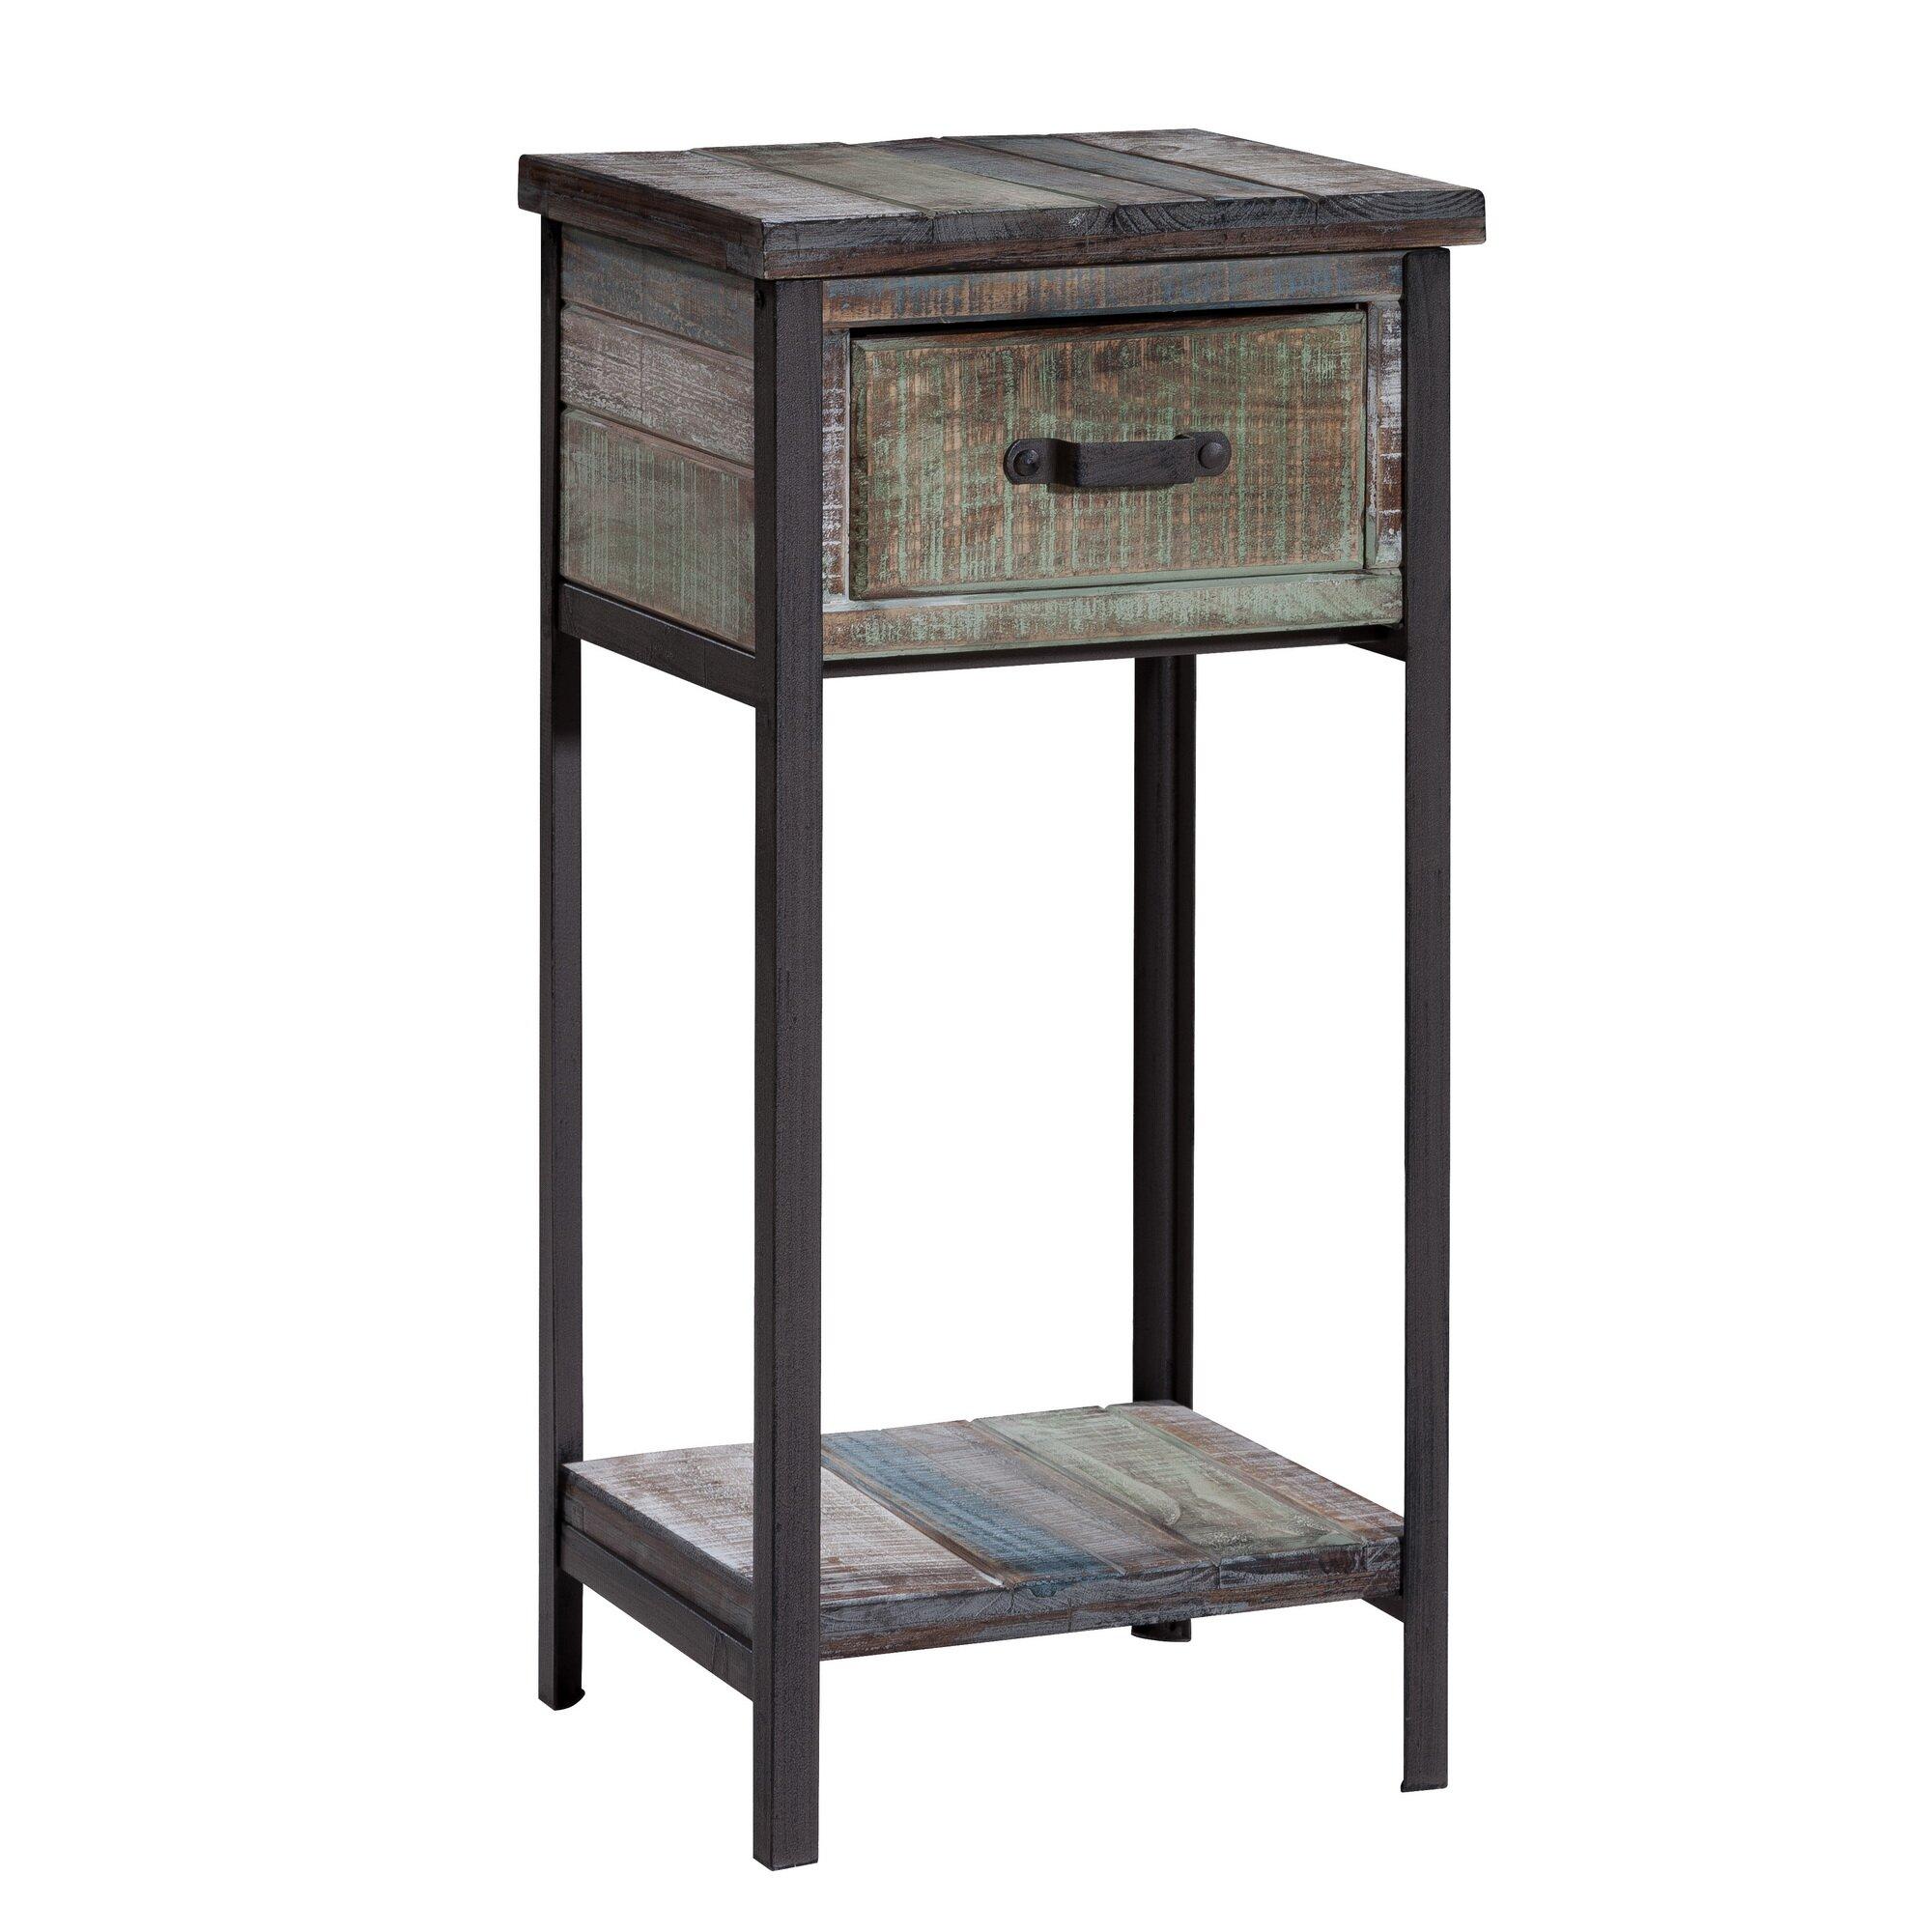 Trent austin design clayera end table reviews wayfair for End tables for sale near me